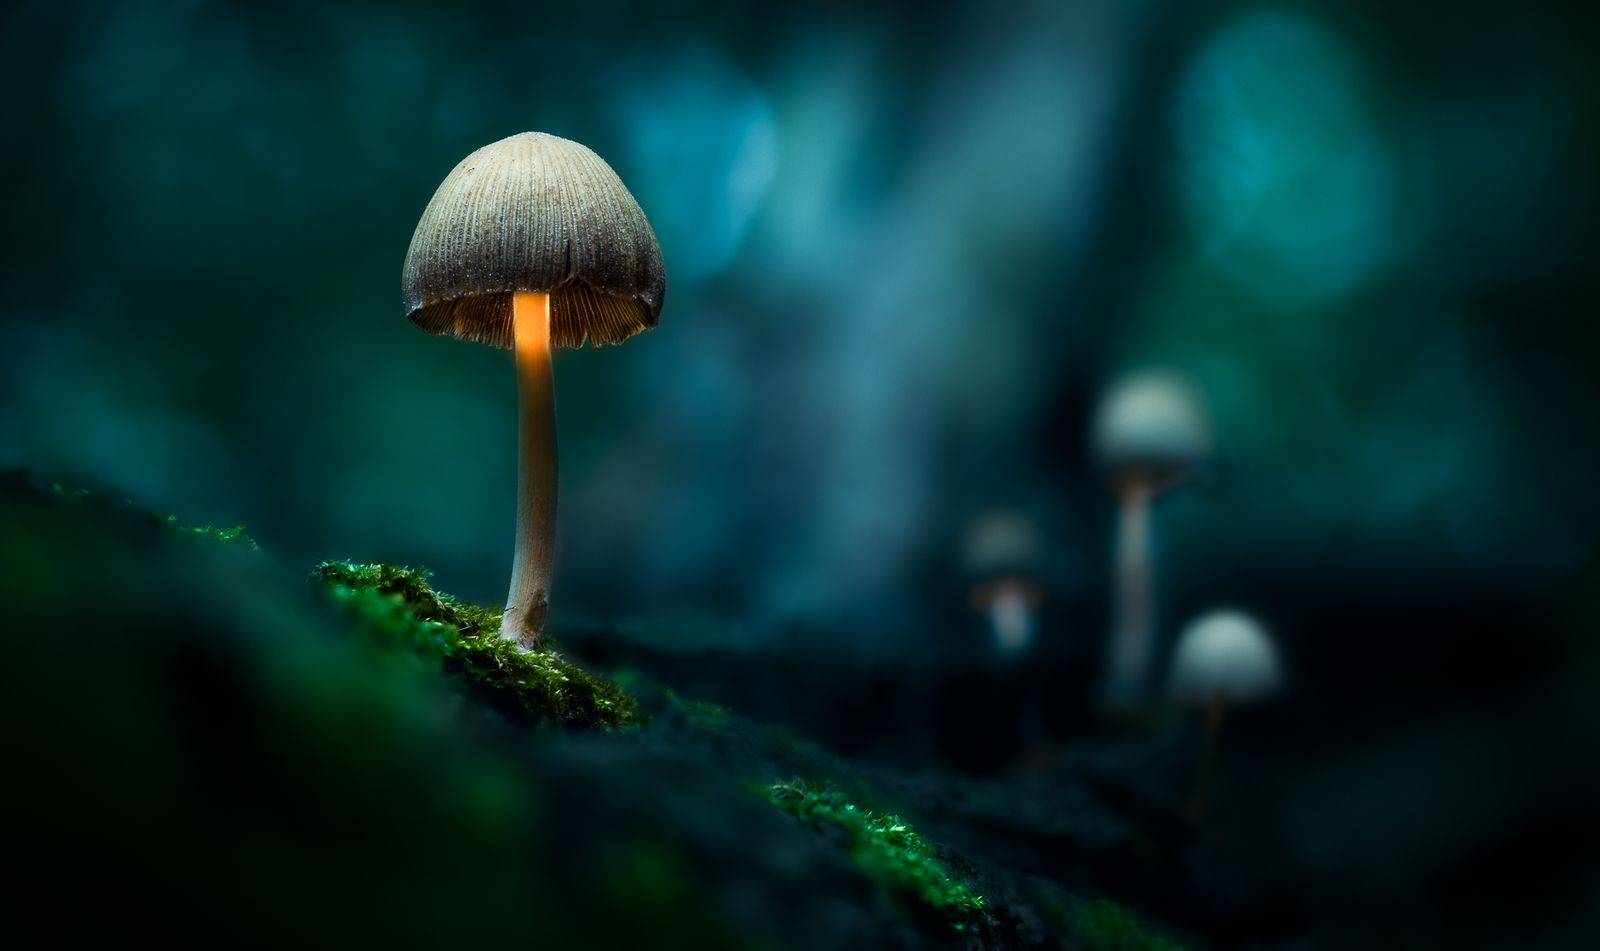 Ethereal Mushrooms